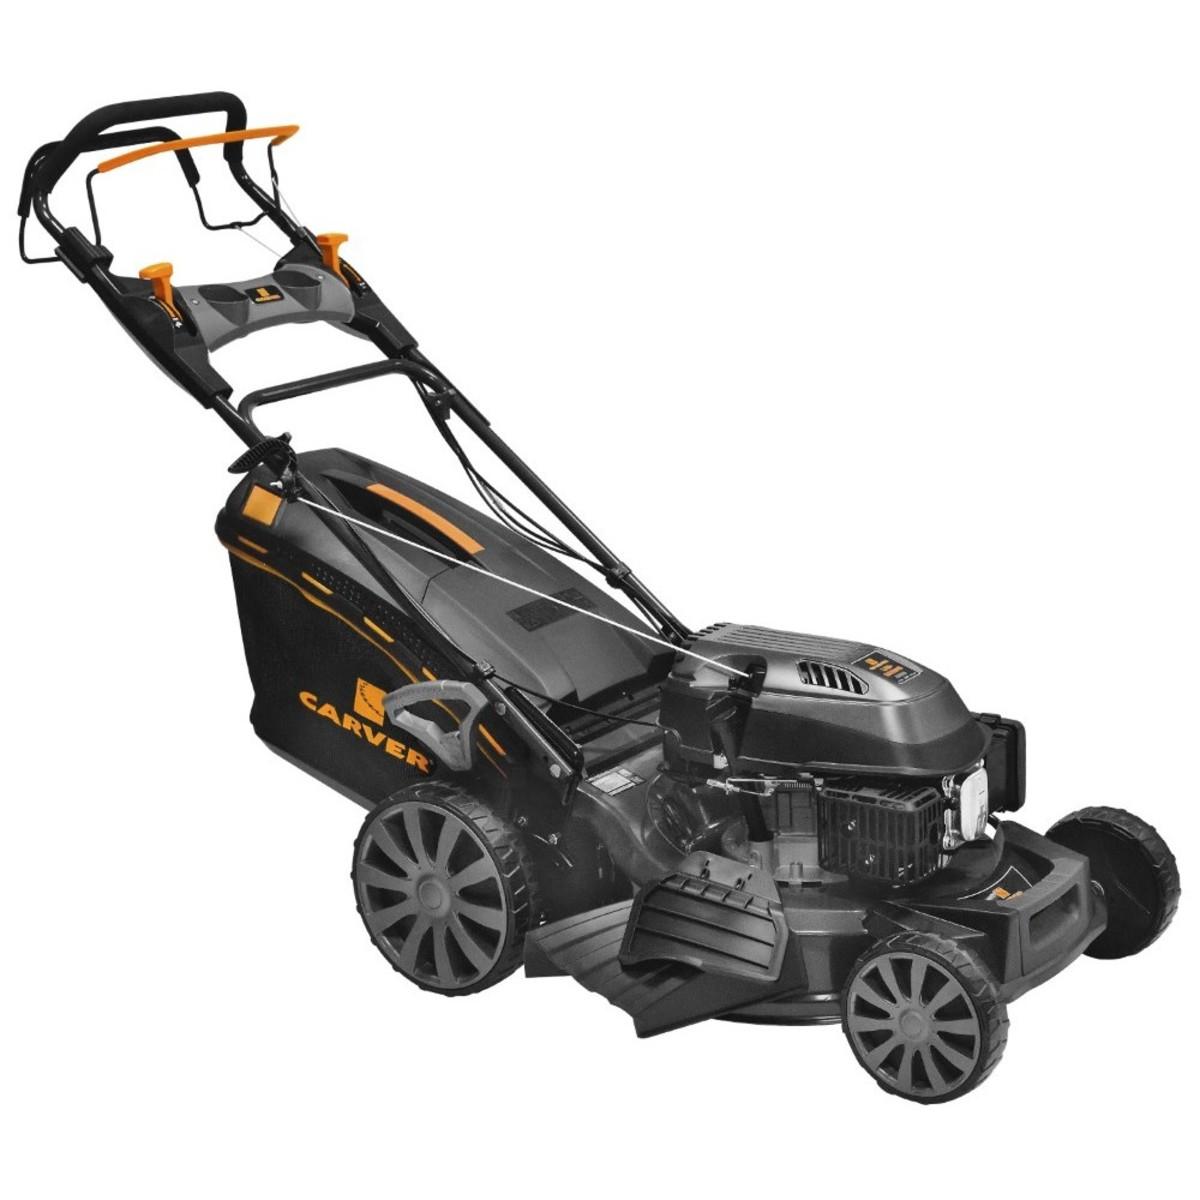 Газонокосилка CARVER LMG-3653DMSE-VS 3600 Вт